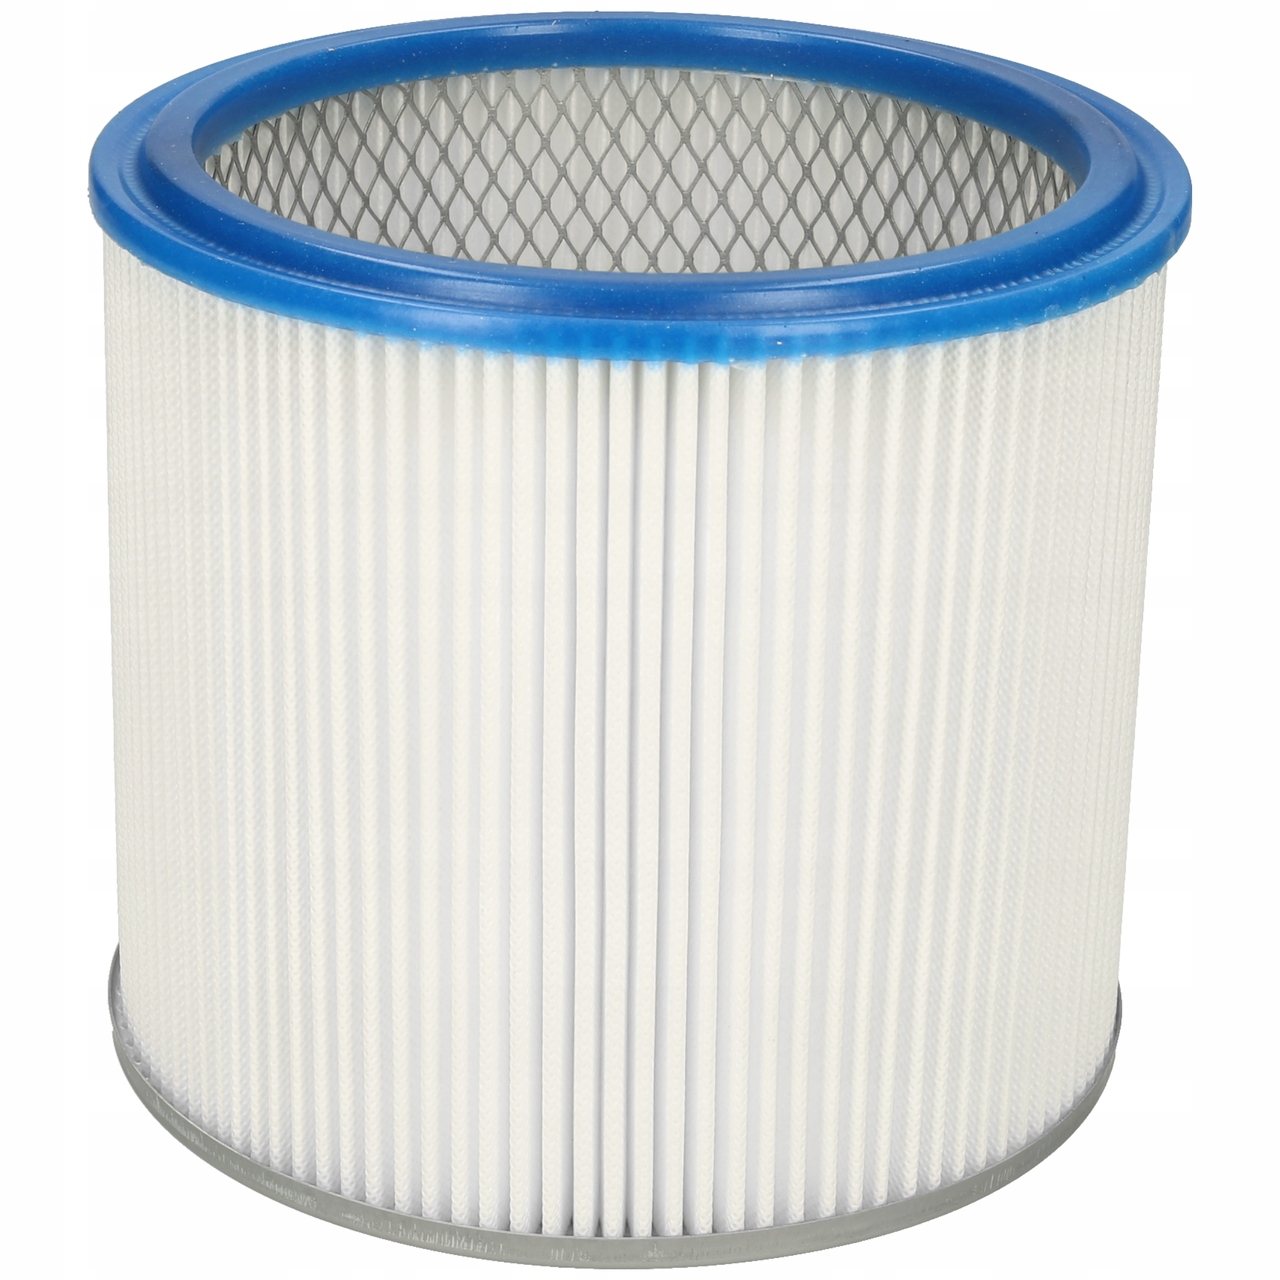 Kónický filter pre vysávač Sparky VC1430M